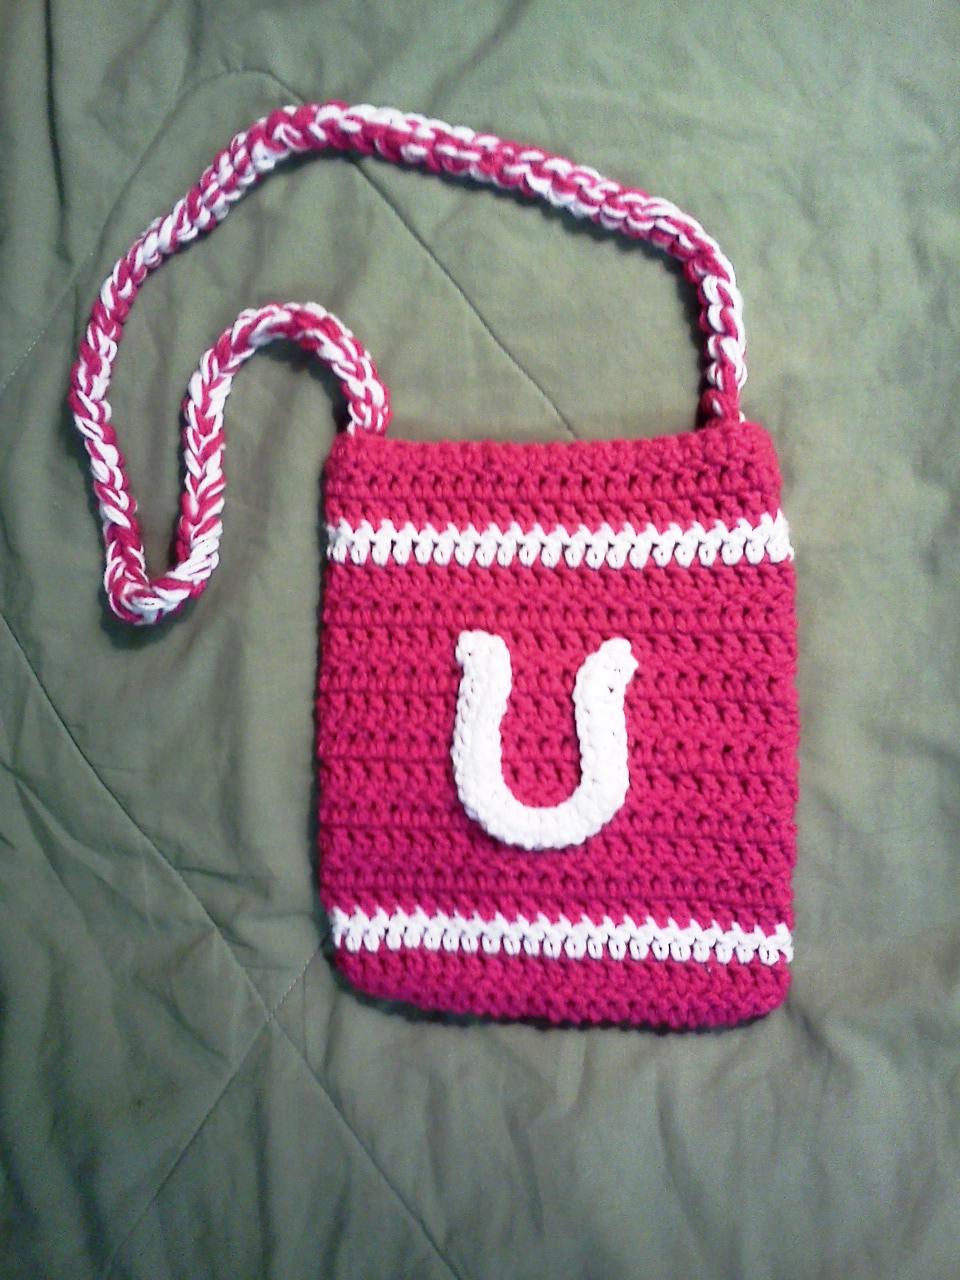 Indianapolis Colts Crochet Purse